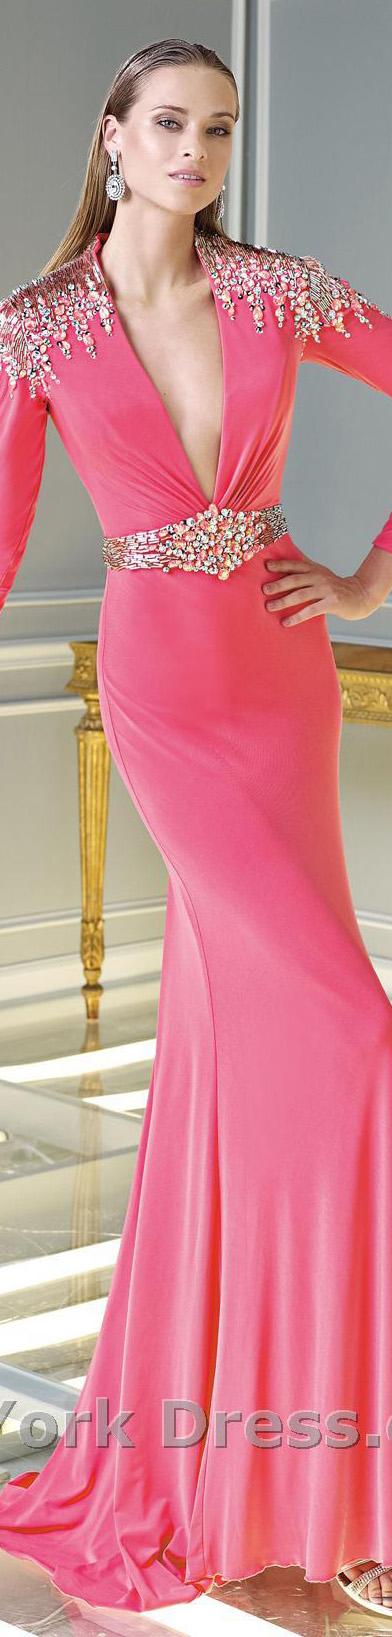 Alyce Paris design | ~LadyLuxury~ | BILLIONAIRE\'S CLOSET | Pinterest ...